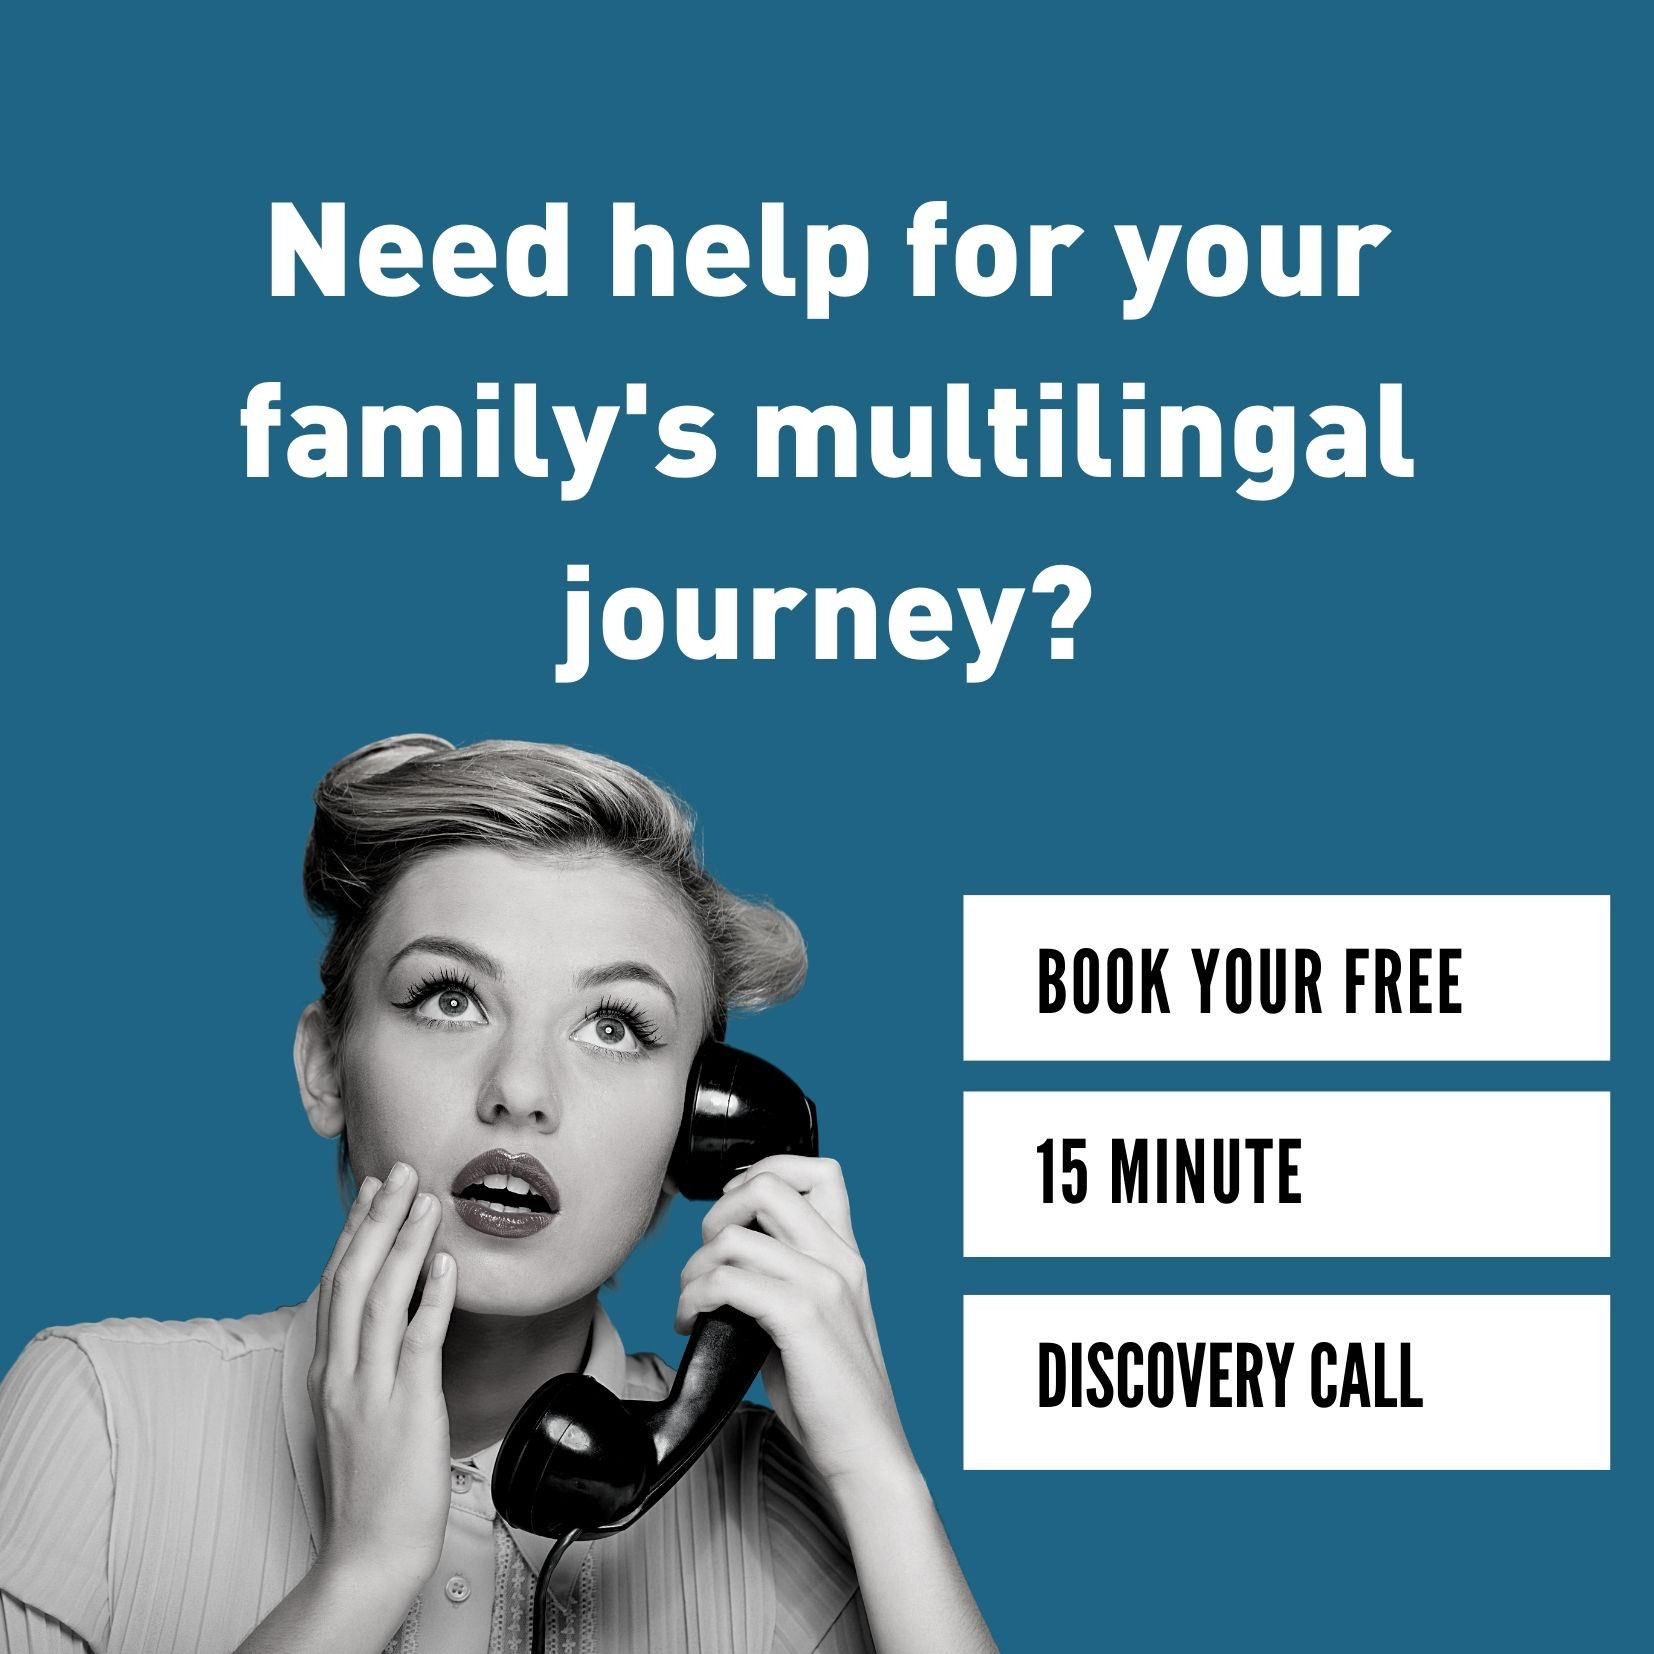 FREE consultation call